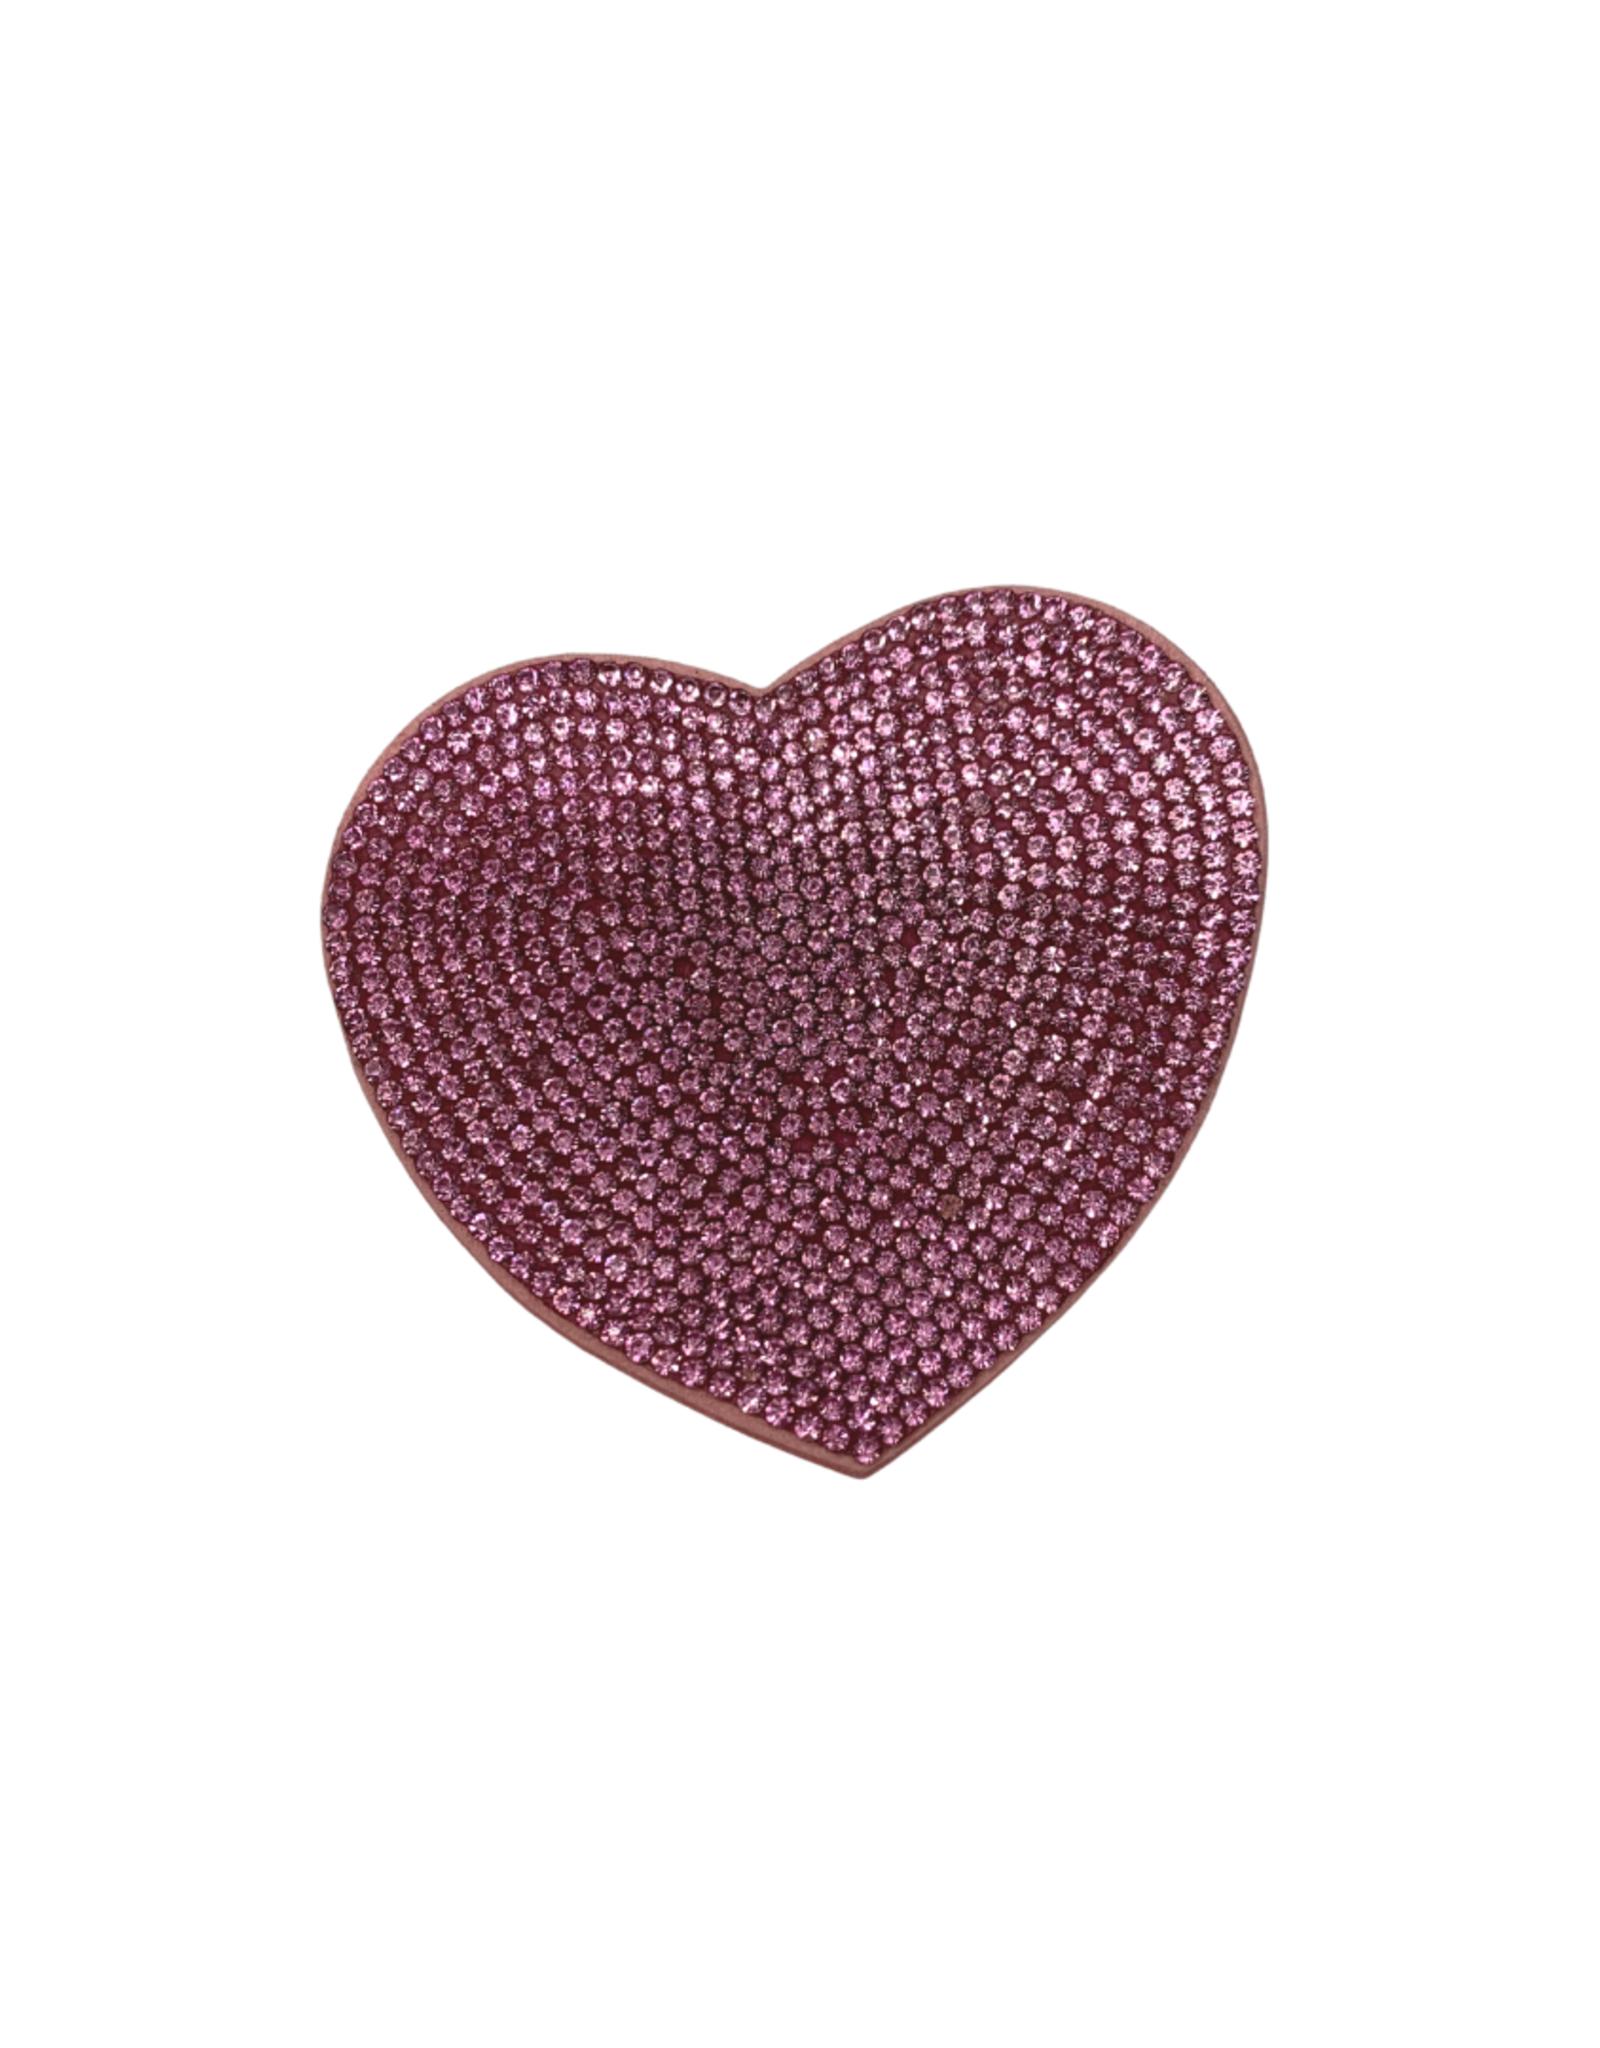 Bows Arts Rhinestone Motif Clip - Pink Heart